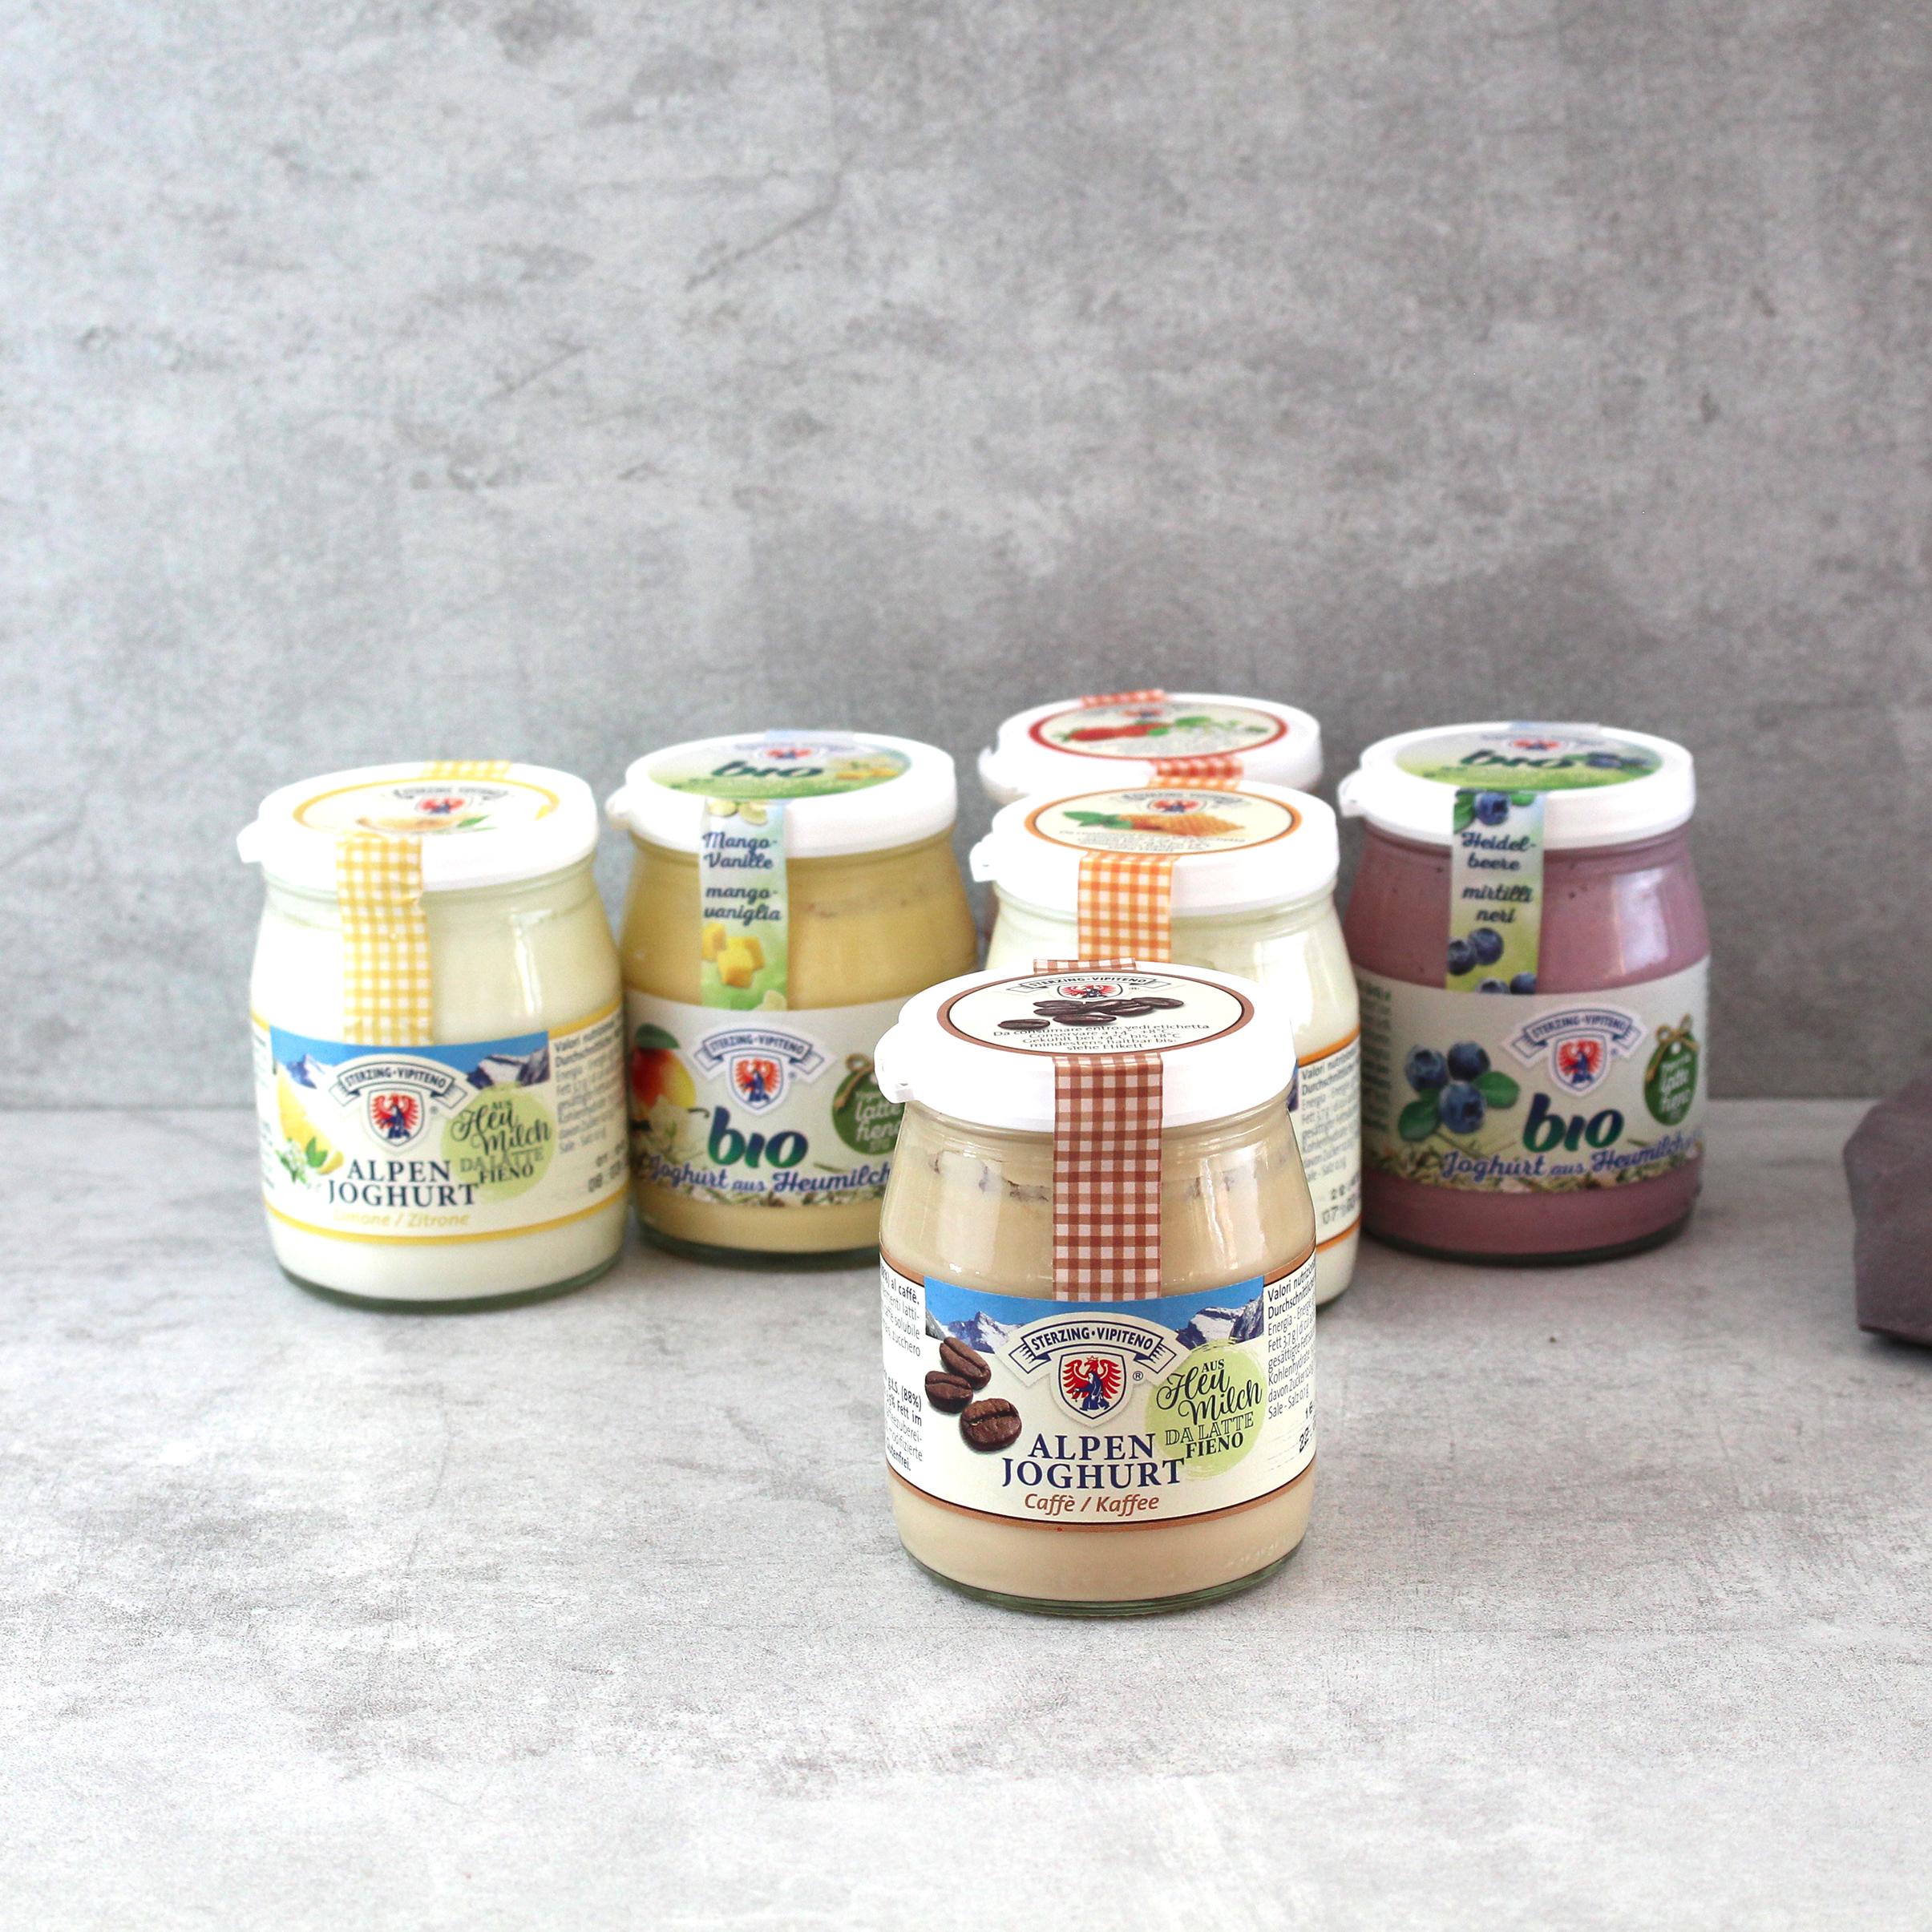 joghurt-sterzinger-kaffee-10x150-g-glas---karton-markthalle20-1